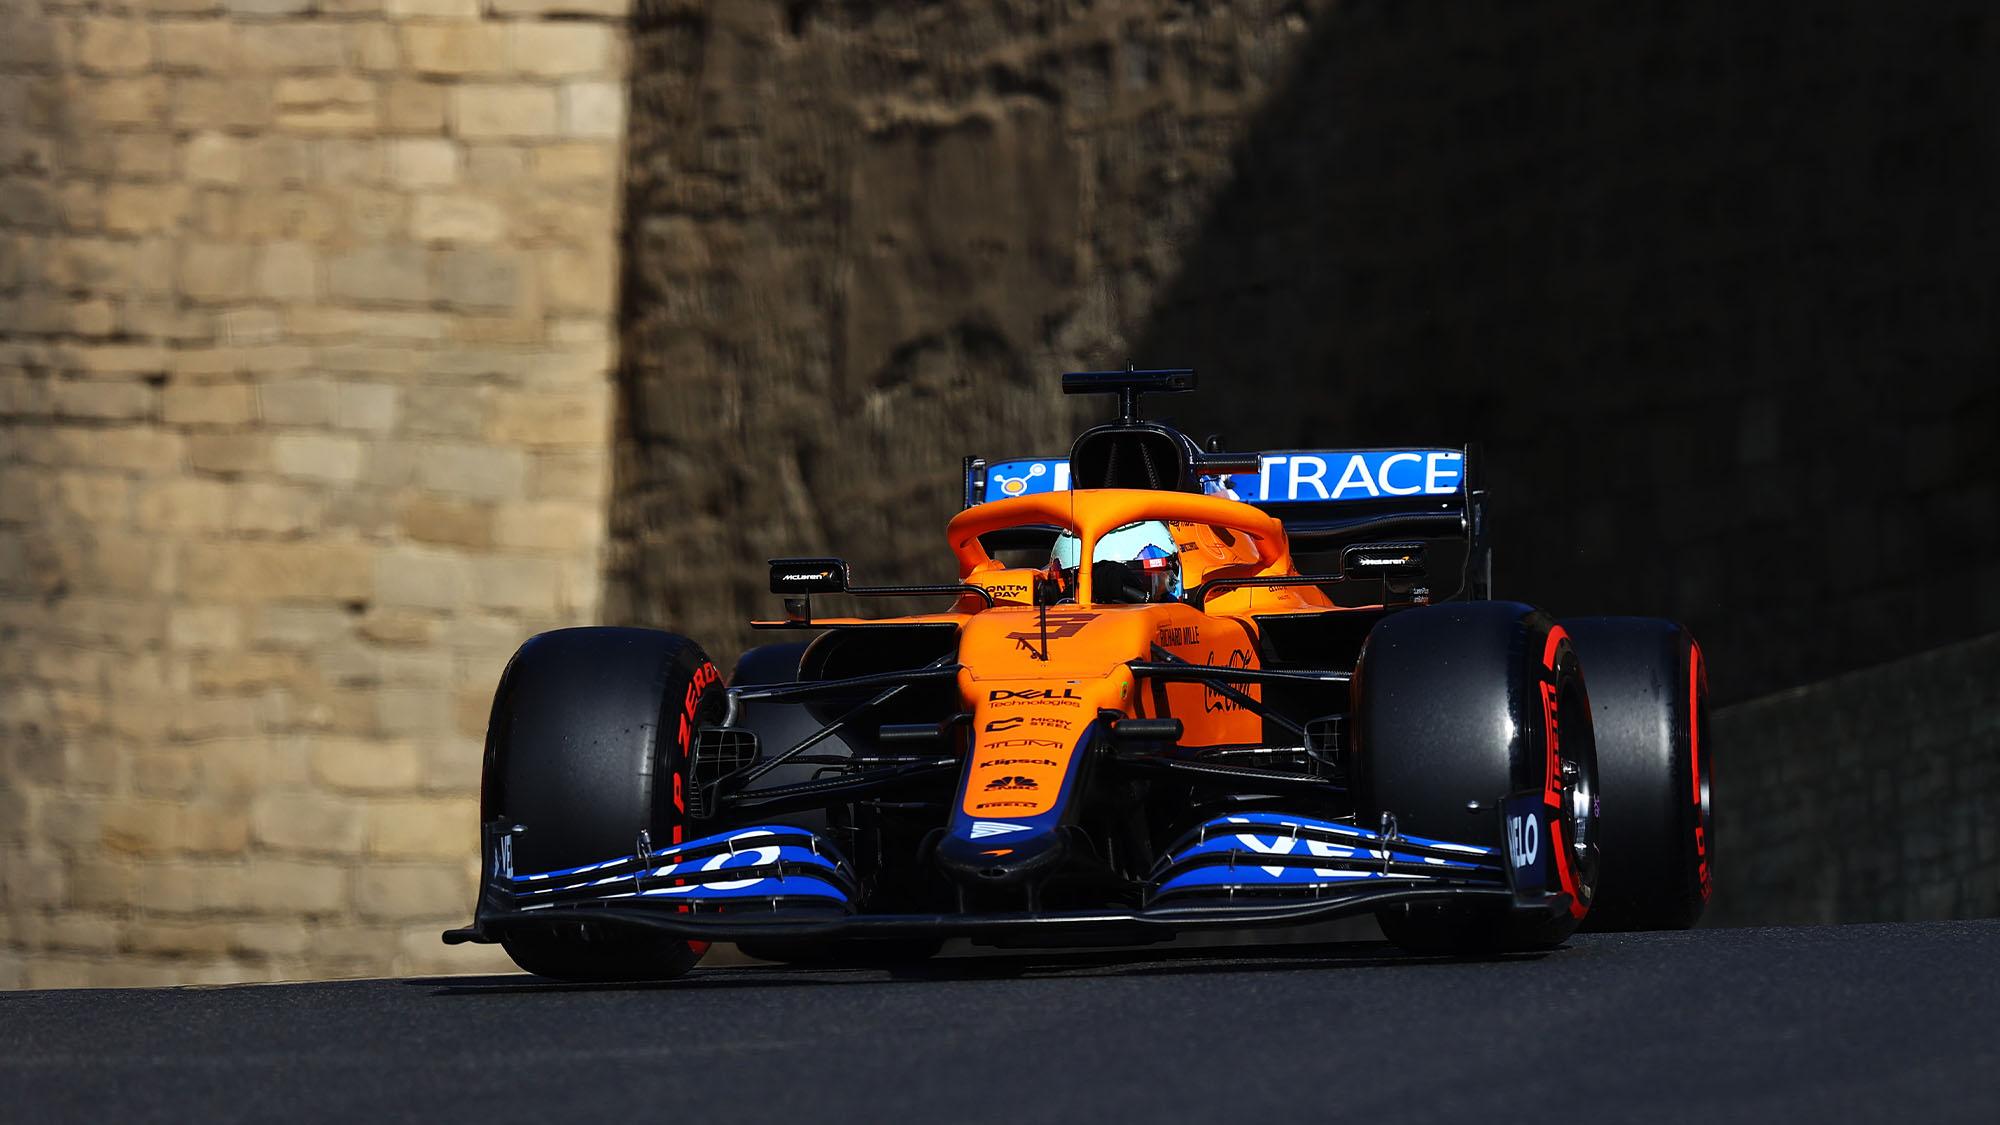 BAKU, AZERBAIJAN - JUNE 05: Daniel Ricciardo of Australia driving the (3) McLaren F1 Team MCL35M Mercedes on track during qualifying ahead of the F1 Grand Prix of Azerbaijan at Baku City Circuit on June 05, 2021 in Baku, Azerbaijan. (Photo by Francois Nel/Getty Images)